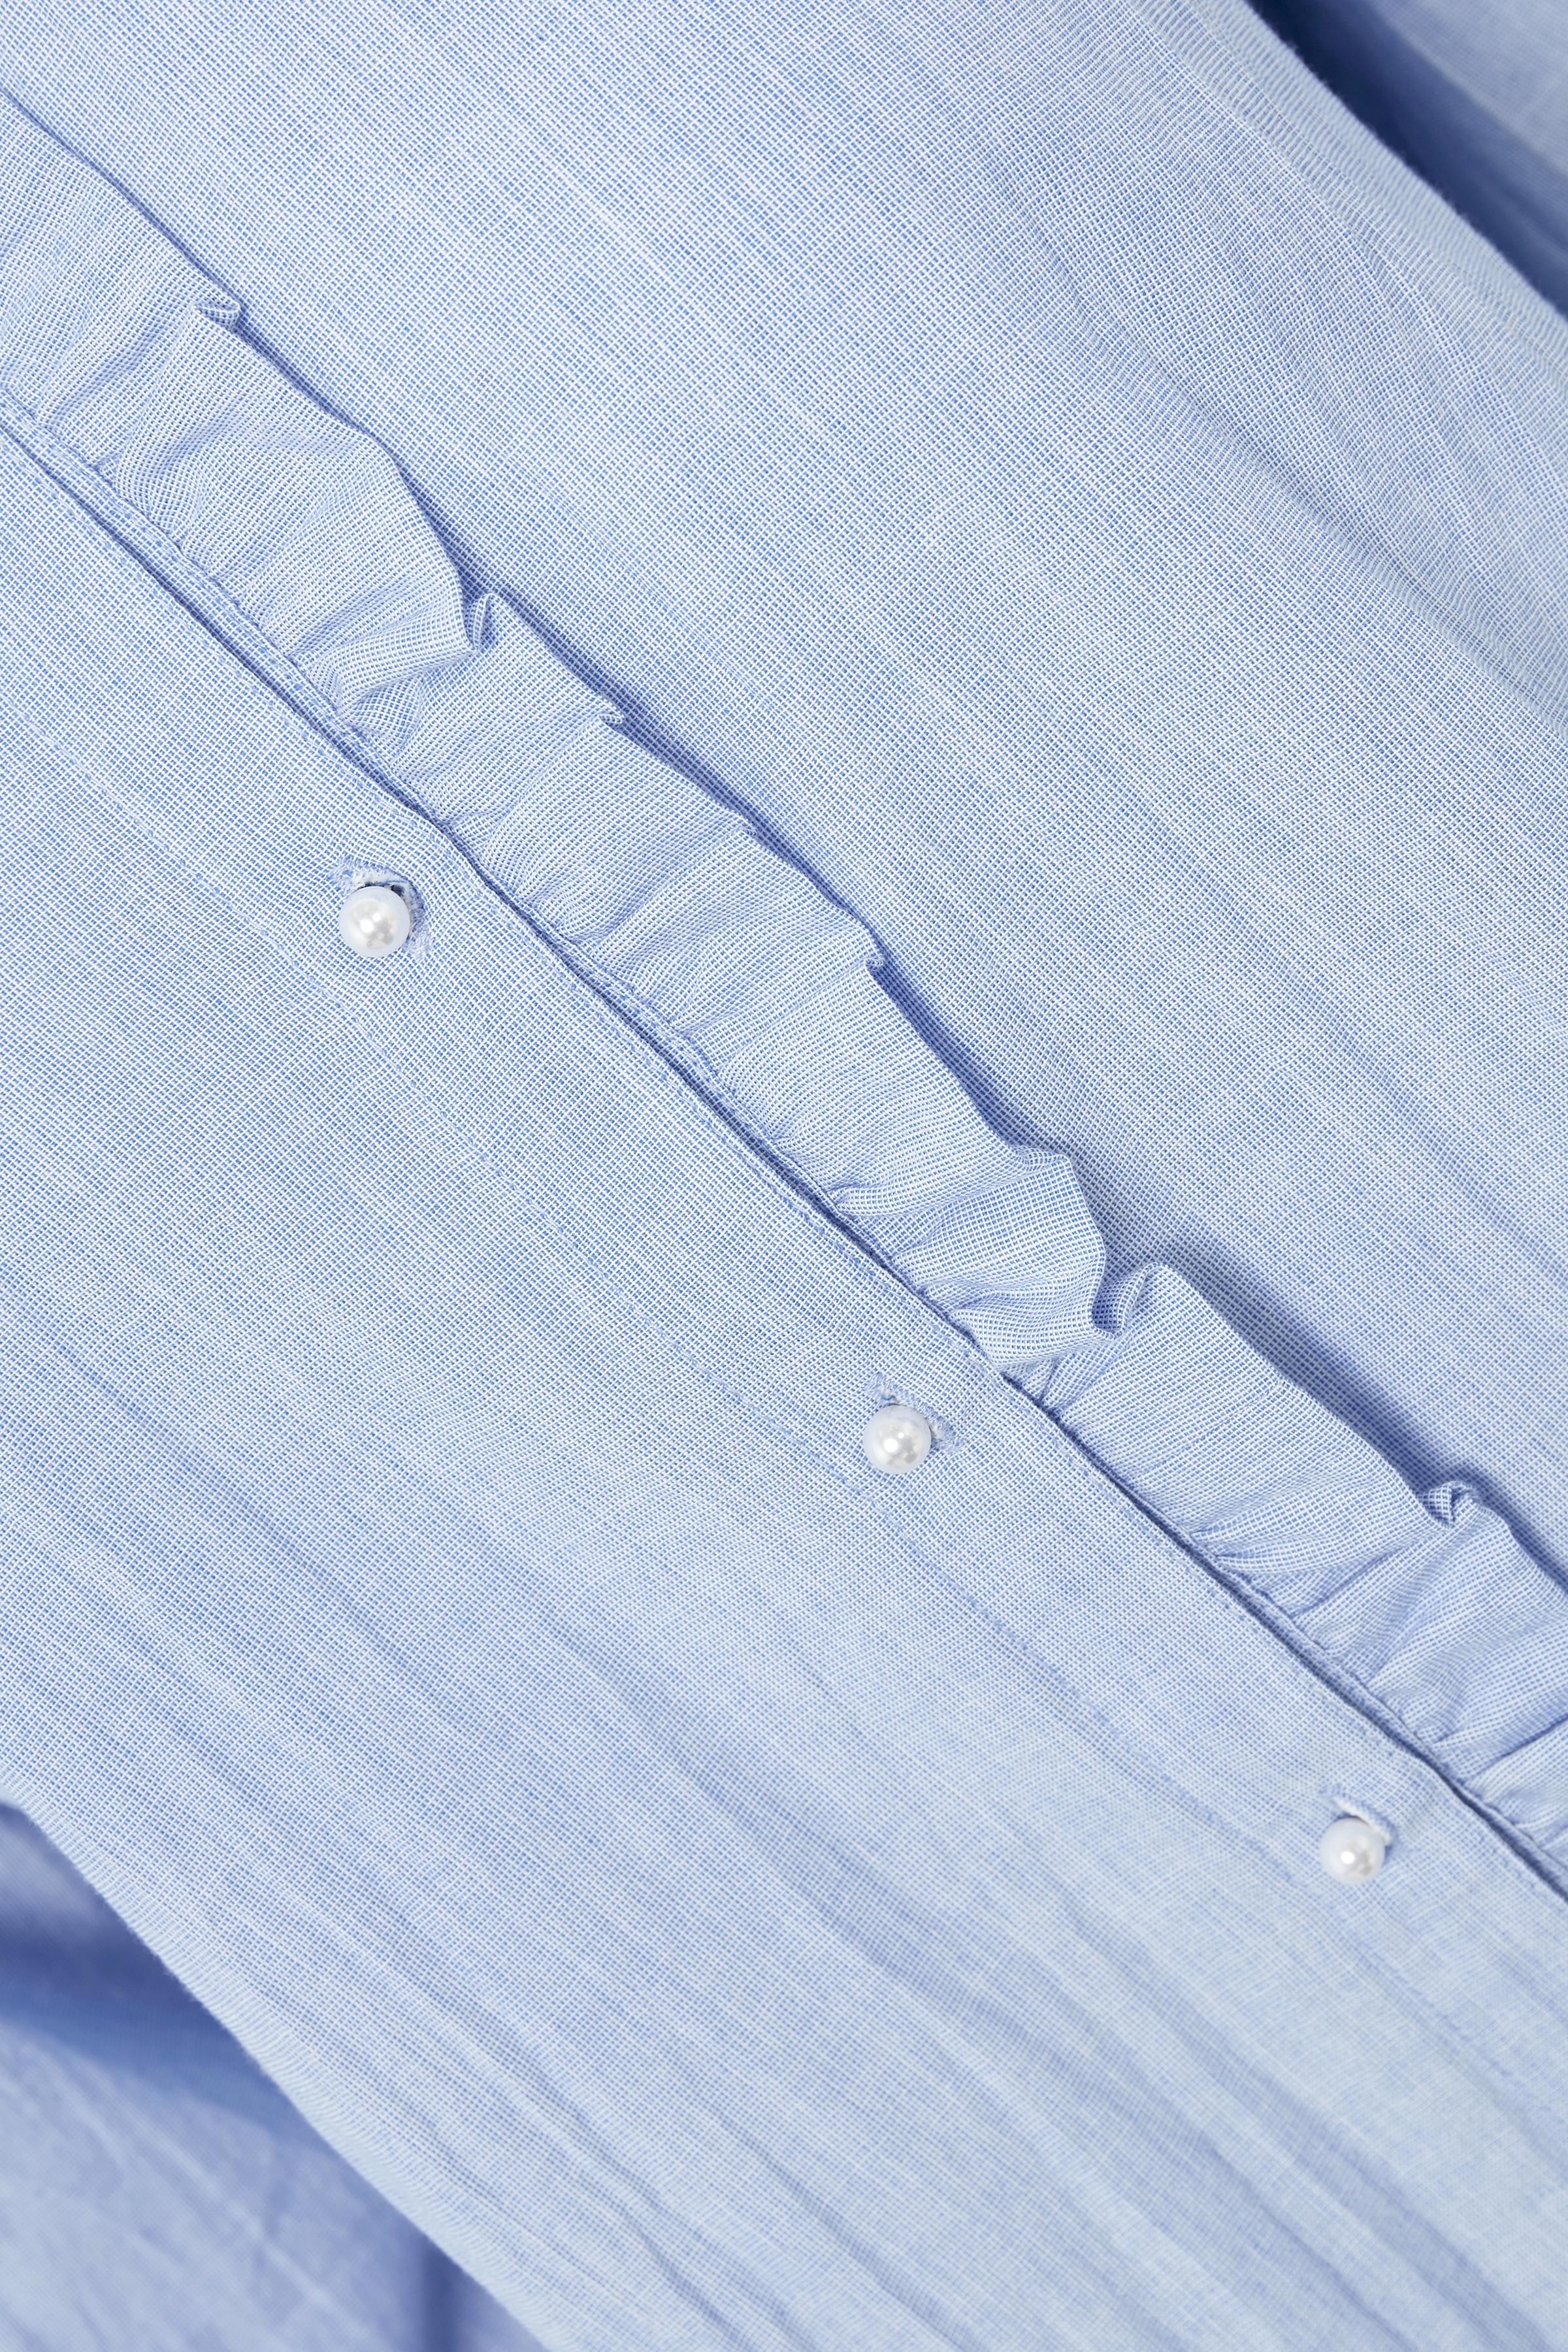 Hellblau Langarm - Hemd von Kaffe – Shoppen Sie Hellblau Langarm - Hemd ab Gr. 34-46 hier